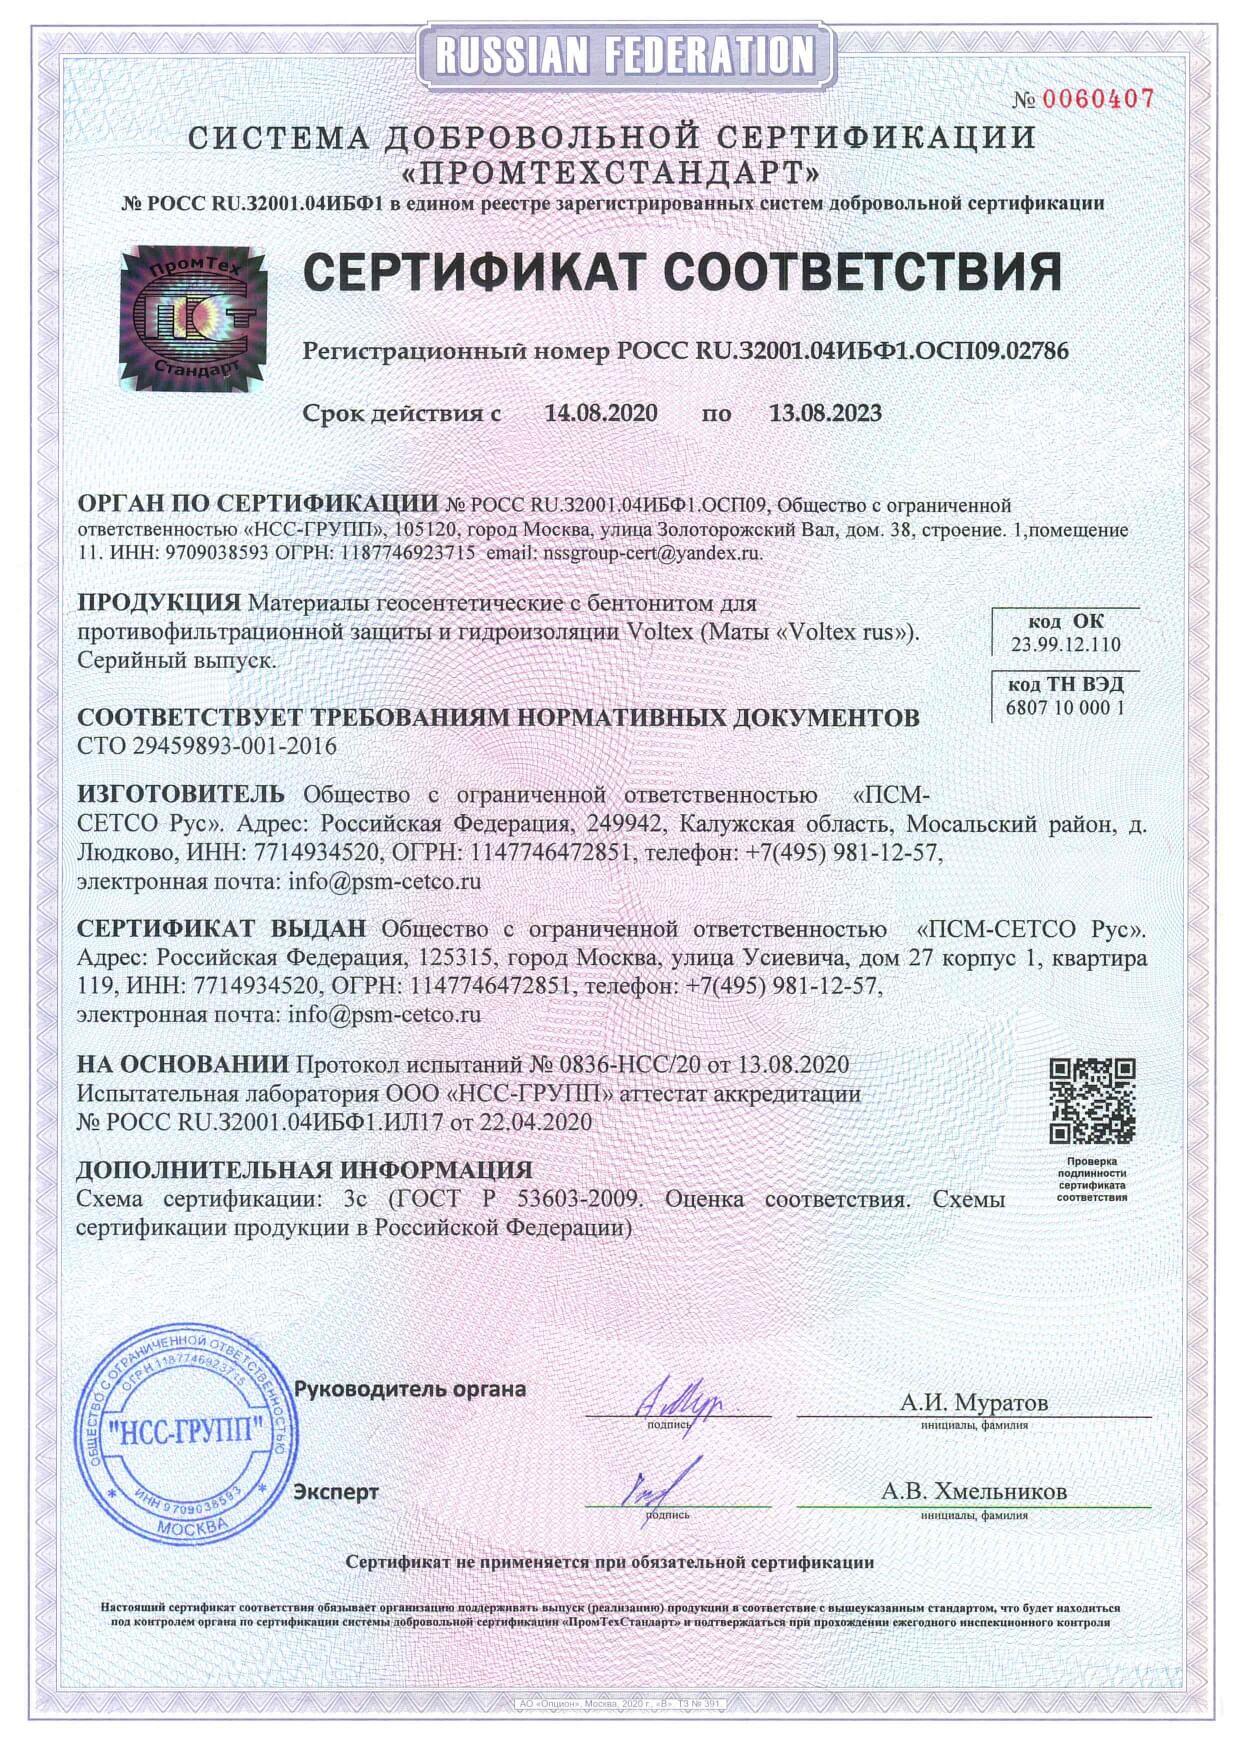 Сертификат  Voltex rus